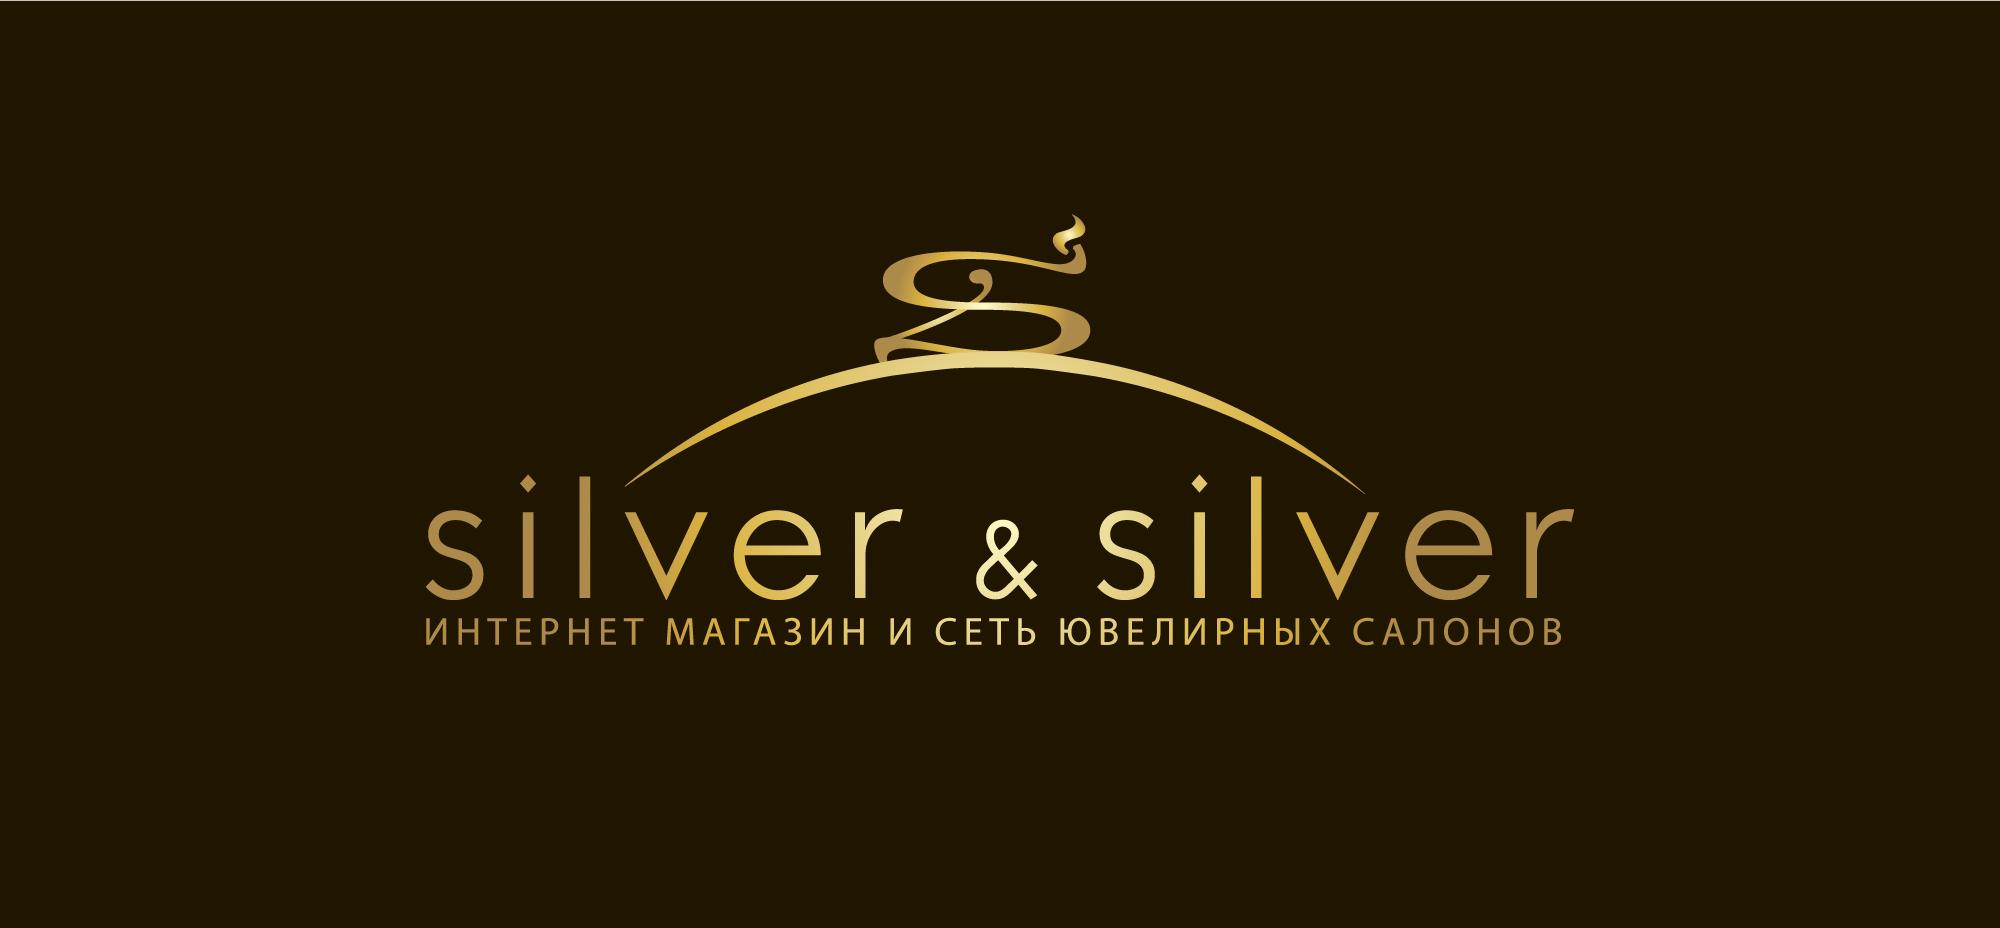 Для Silver & Silver